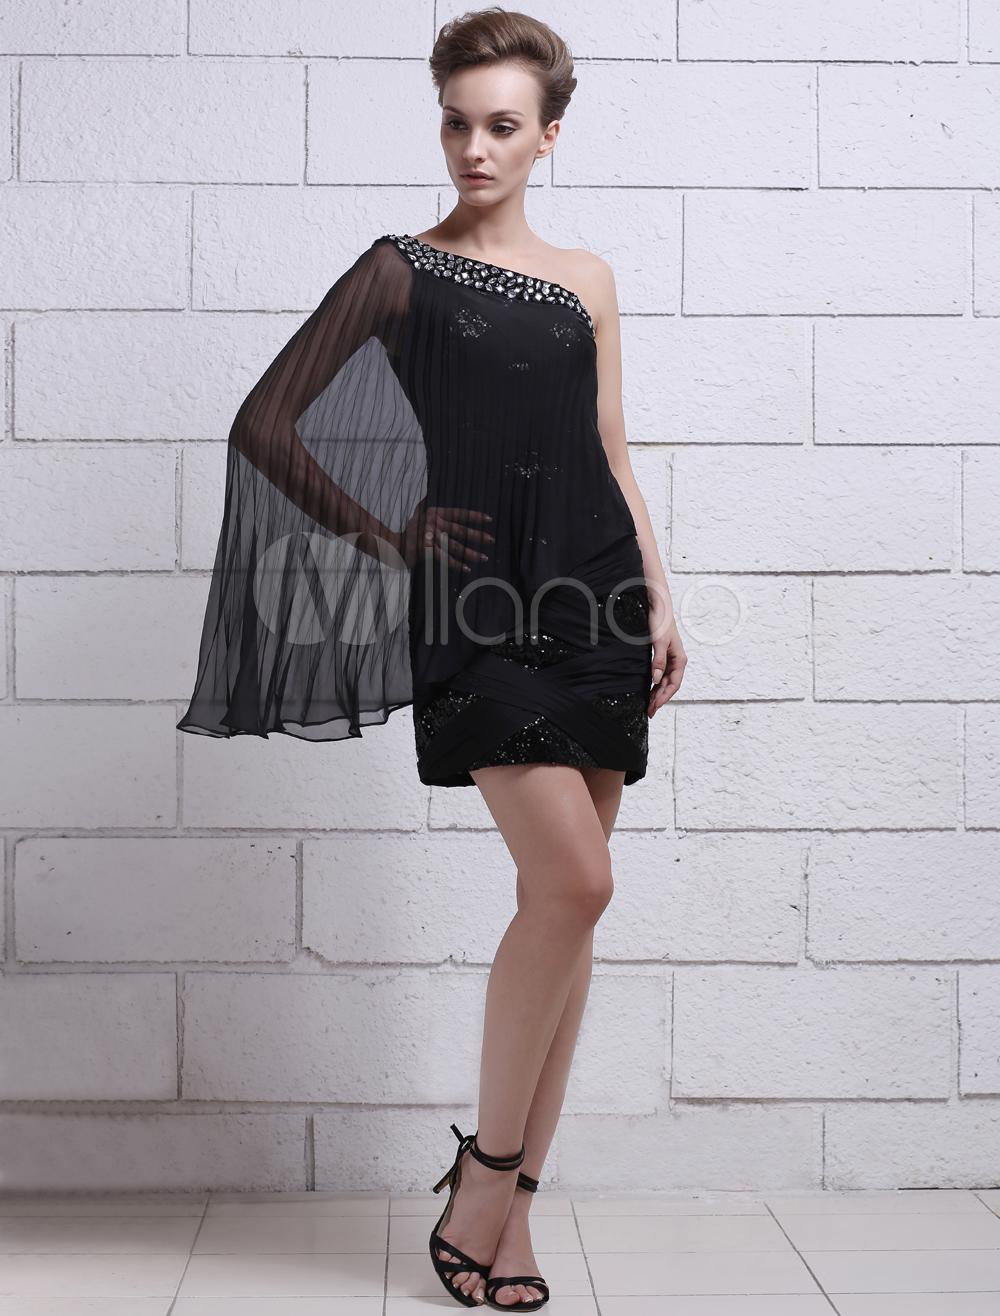 Black Beading One-Shoulder Long Sleeves Sheath Chiffon Evening Dress Milanoo (Wedding Evening Dresses) photo